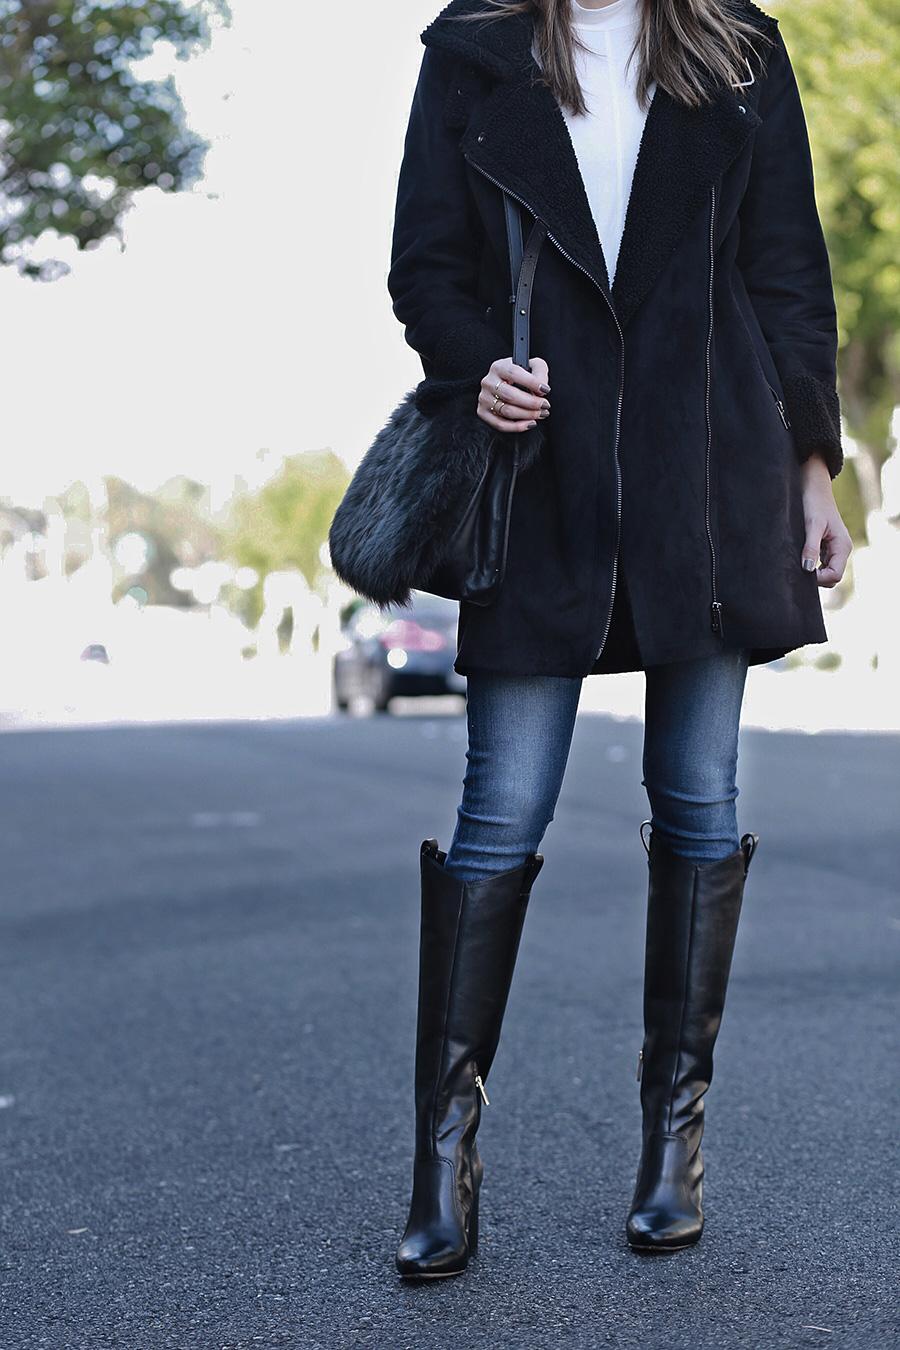 Black Boots Black Coat | brittanyxavier.com